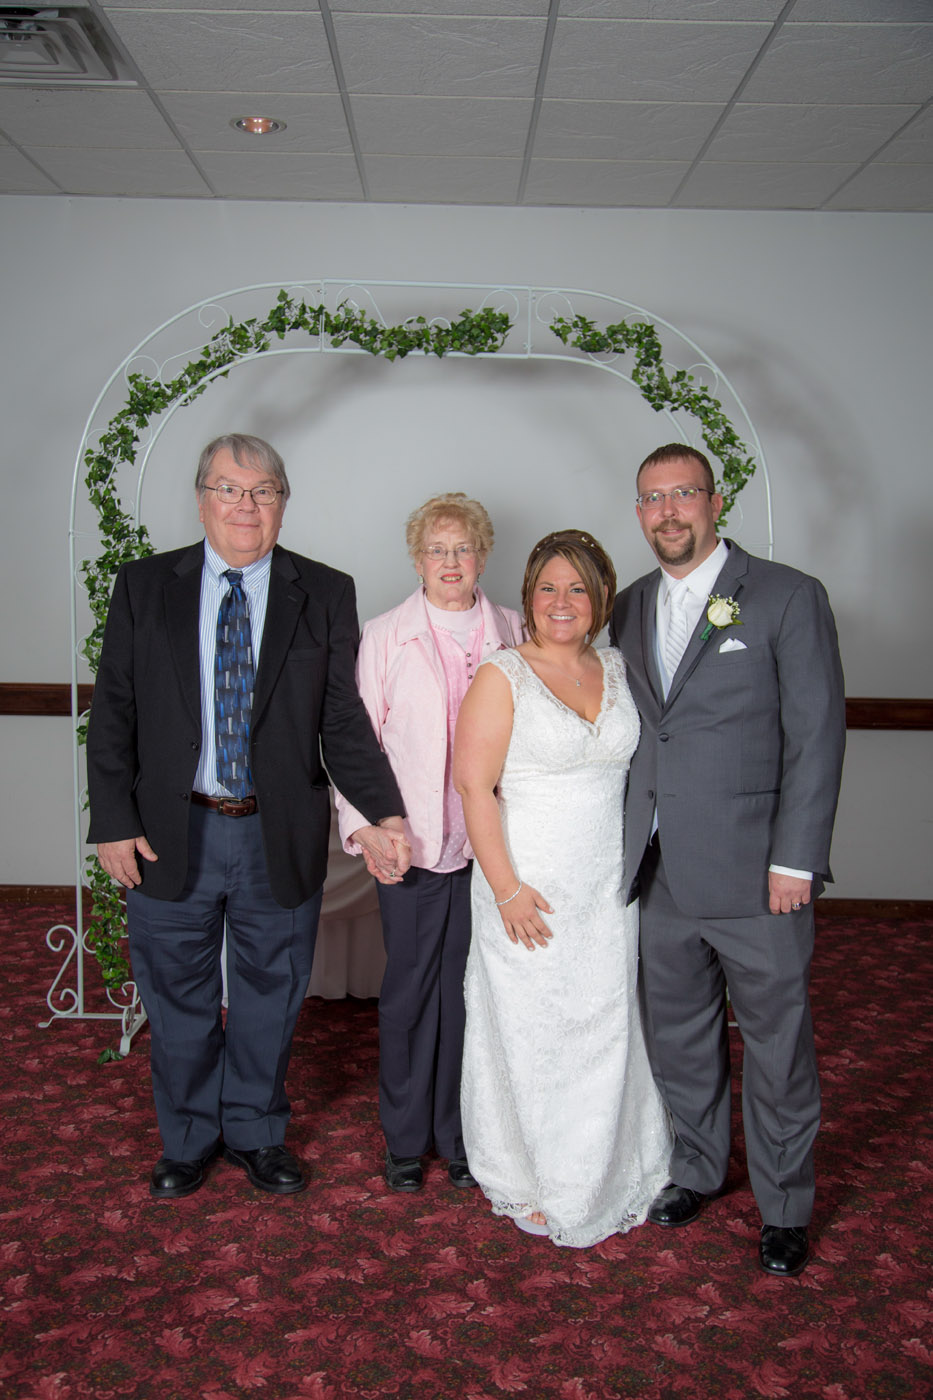 Healy Wedding 1 1421.jpg